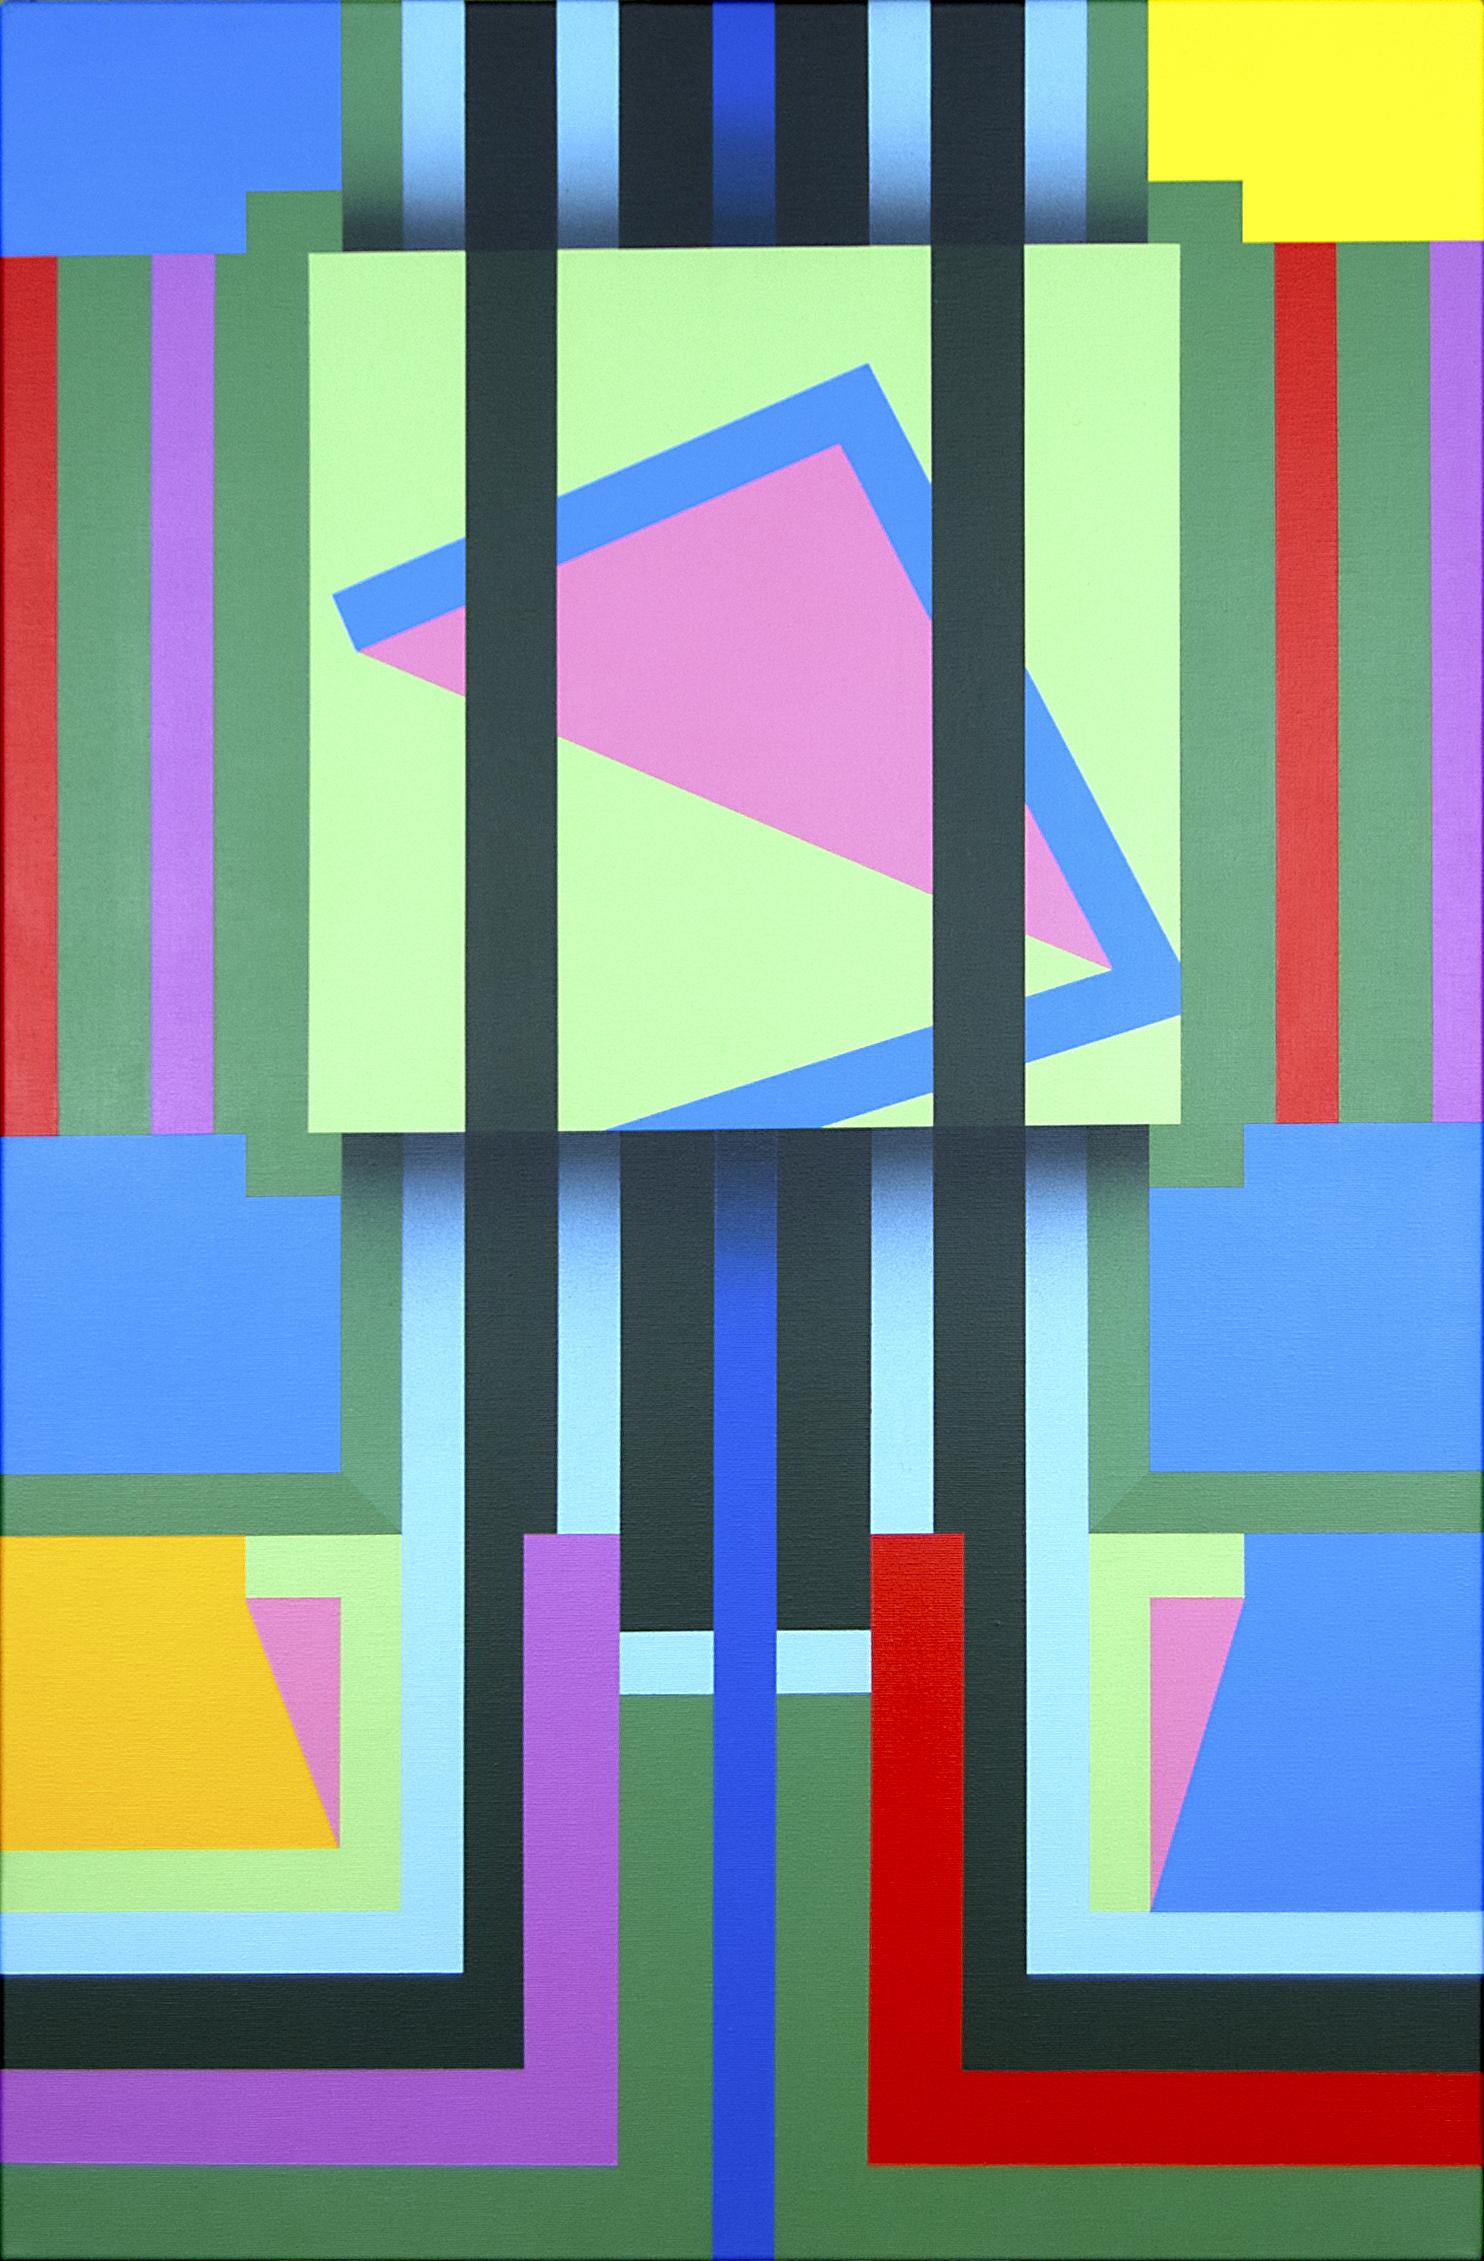 Graham King, The Artists Studio, Acrylic on canvas, 91.4cm x 61cm x 1.6cm